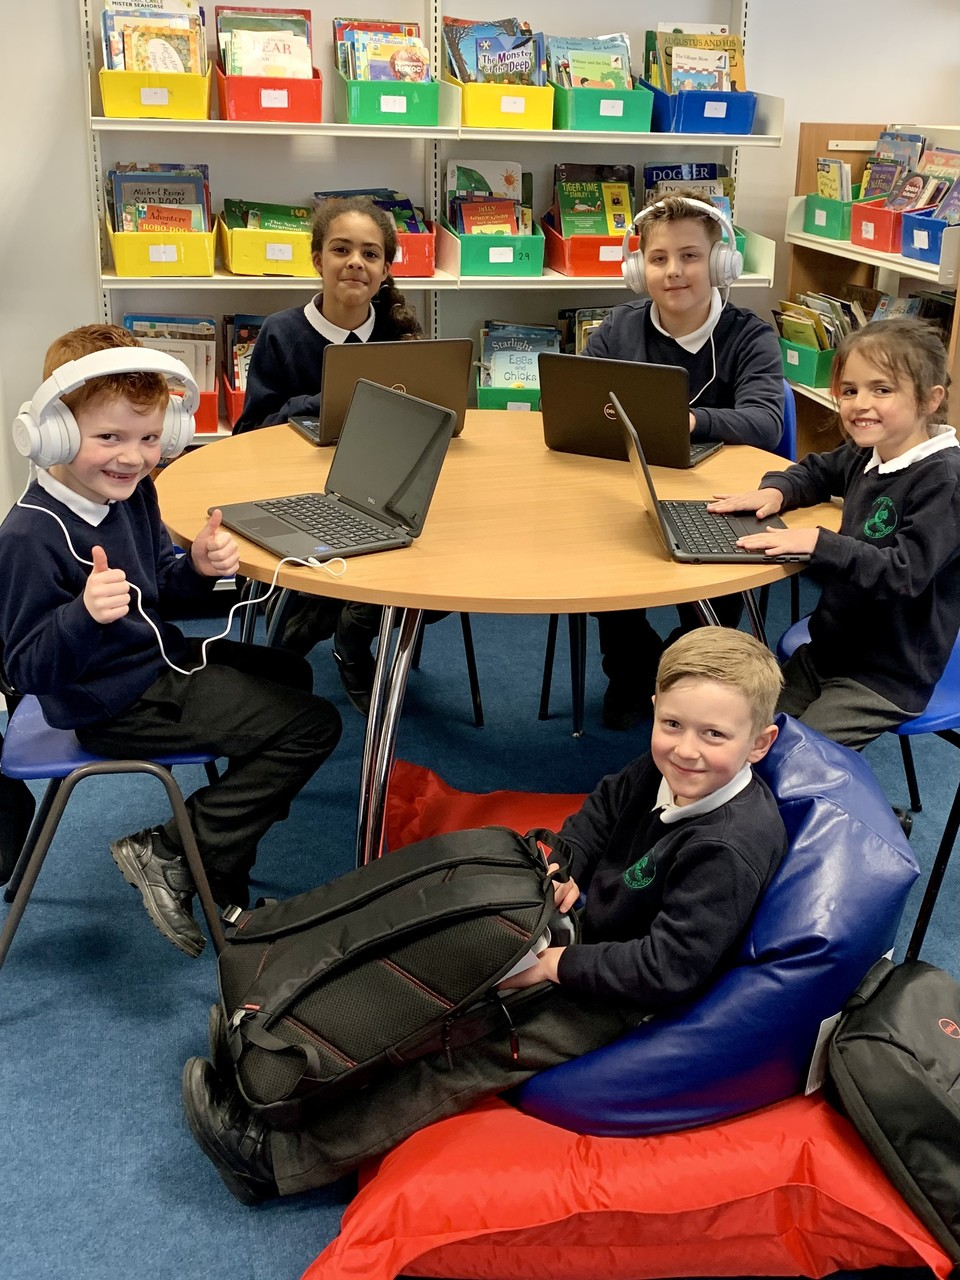 Chilton Community Primary School receive laptops and tech bundles from Asda | Asda Stowmarket